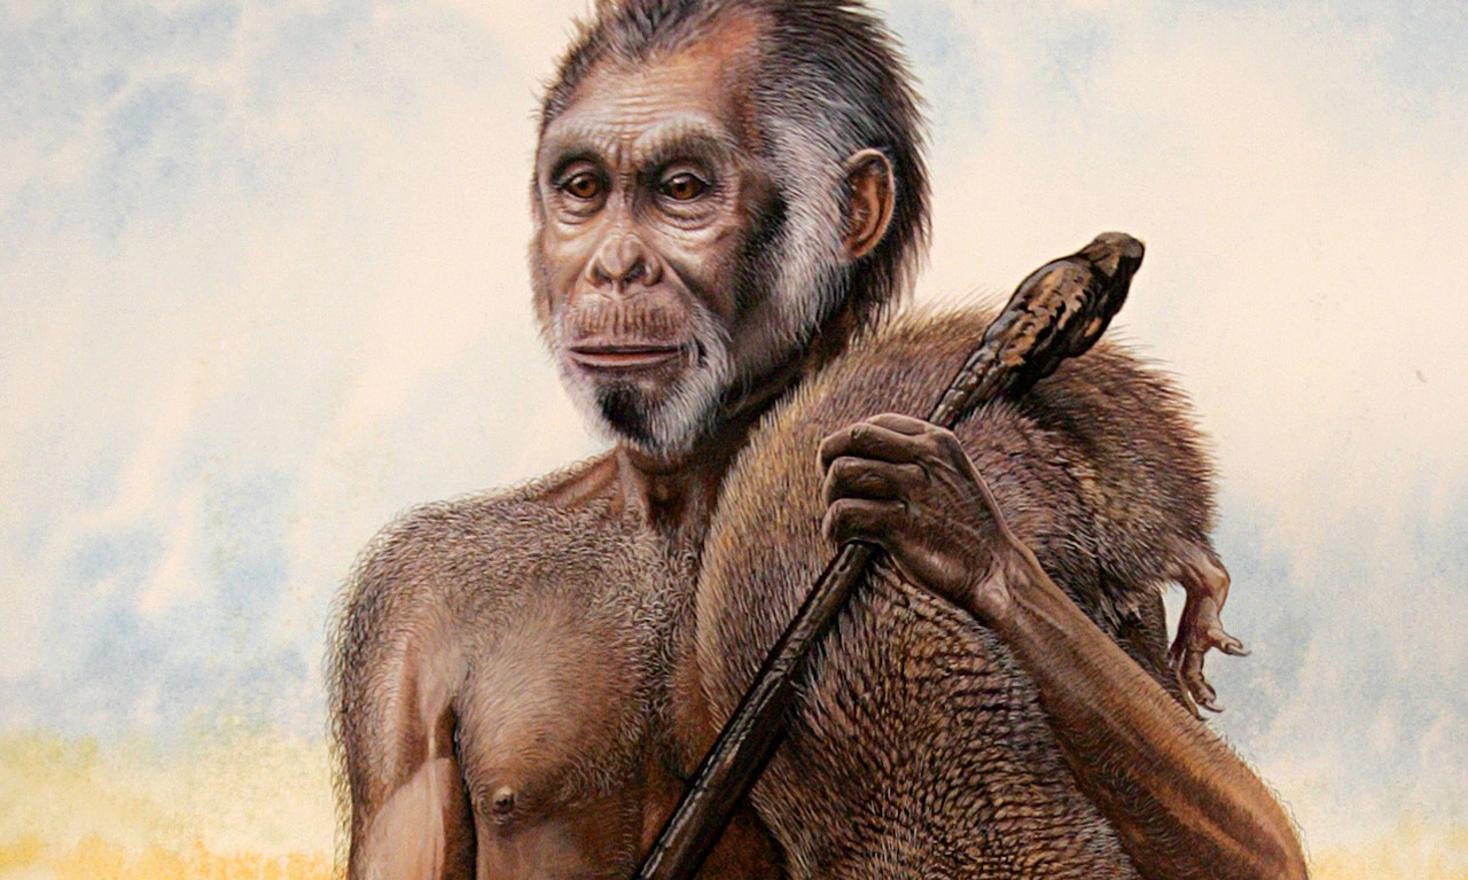 Homo Floresiensis Scientists Clash Over Claims Hobbit